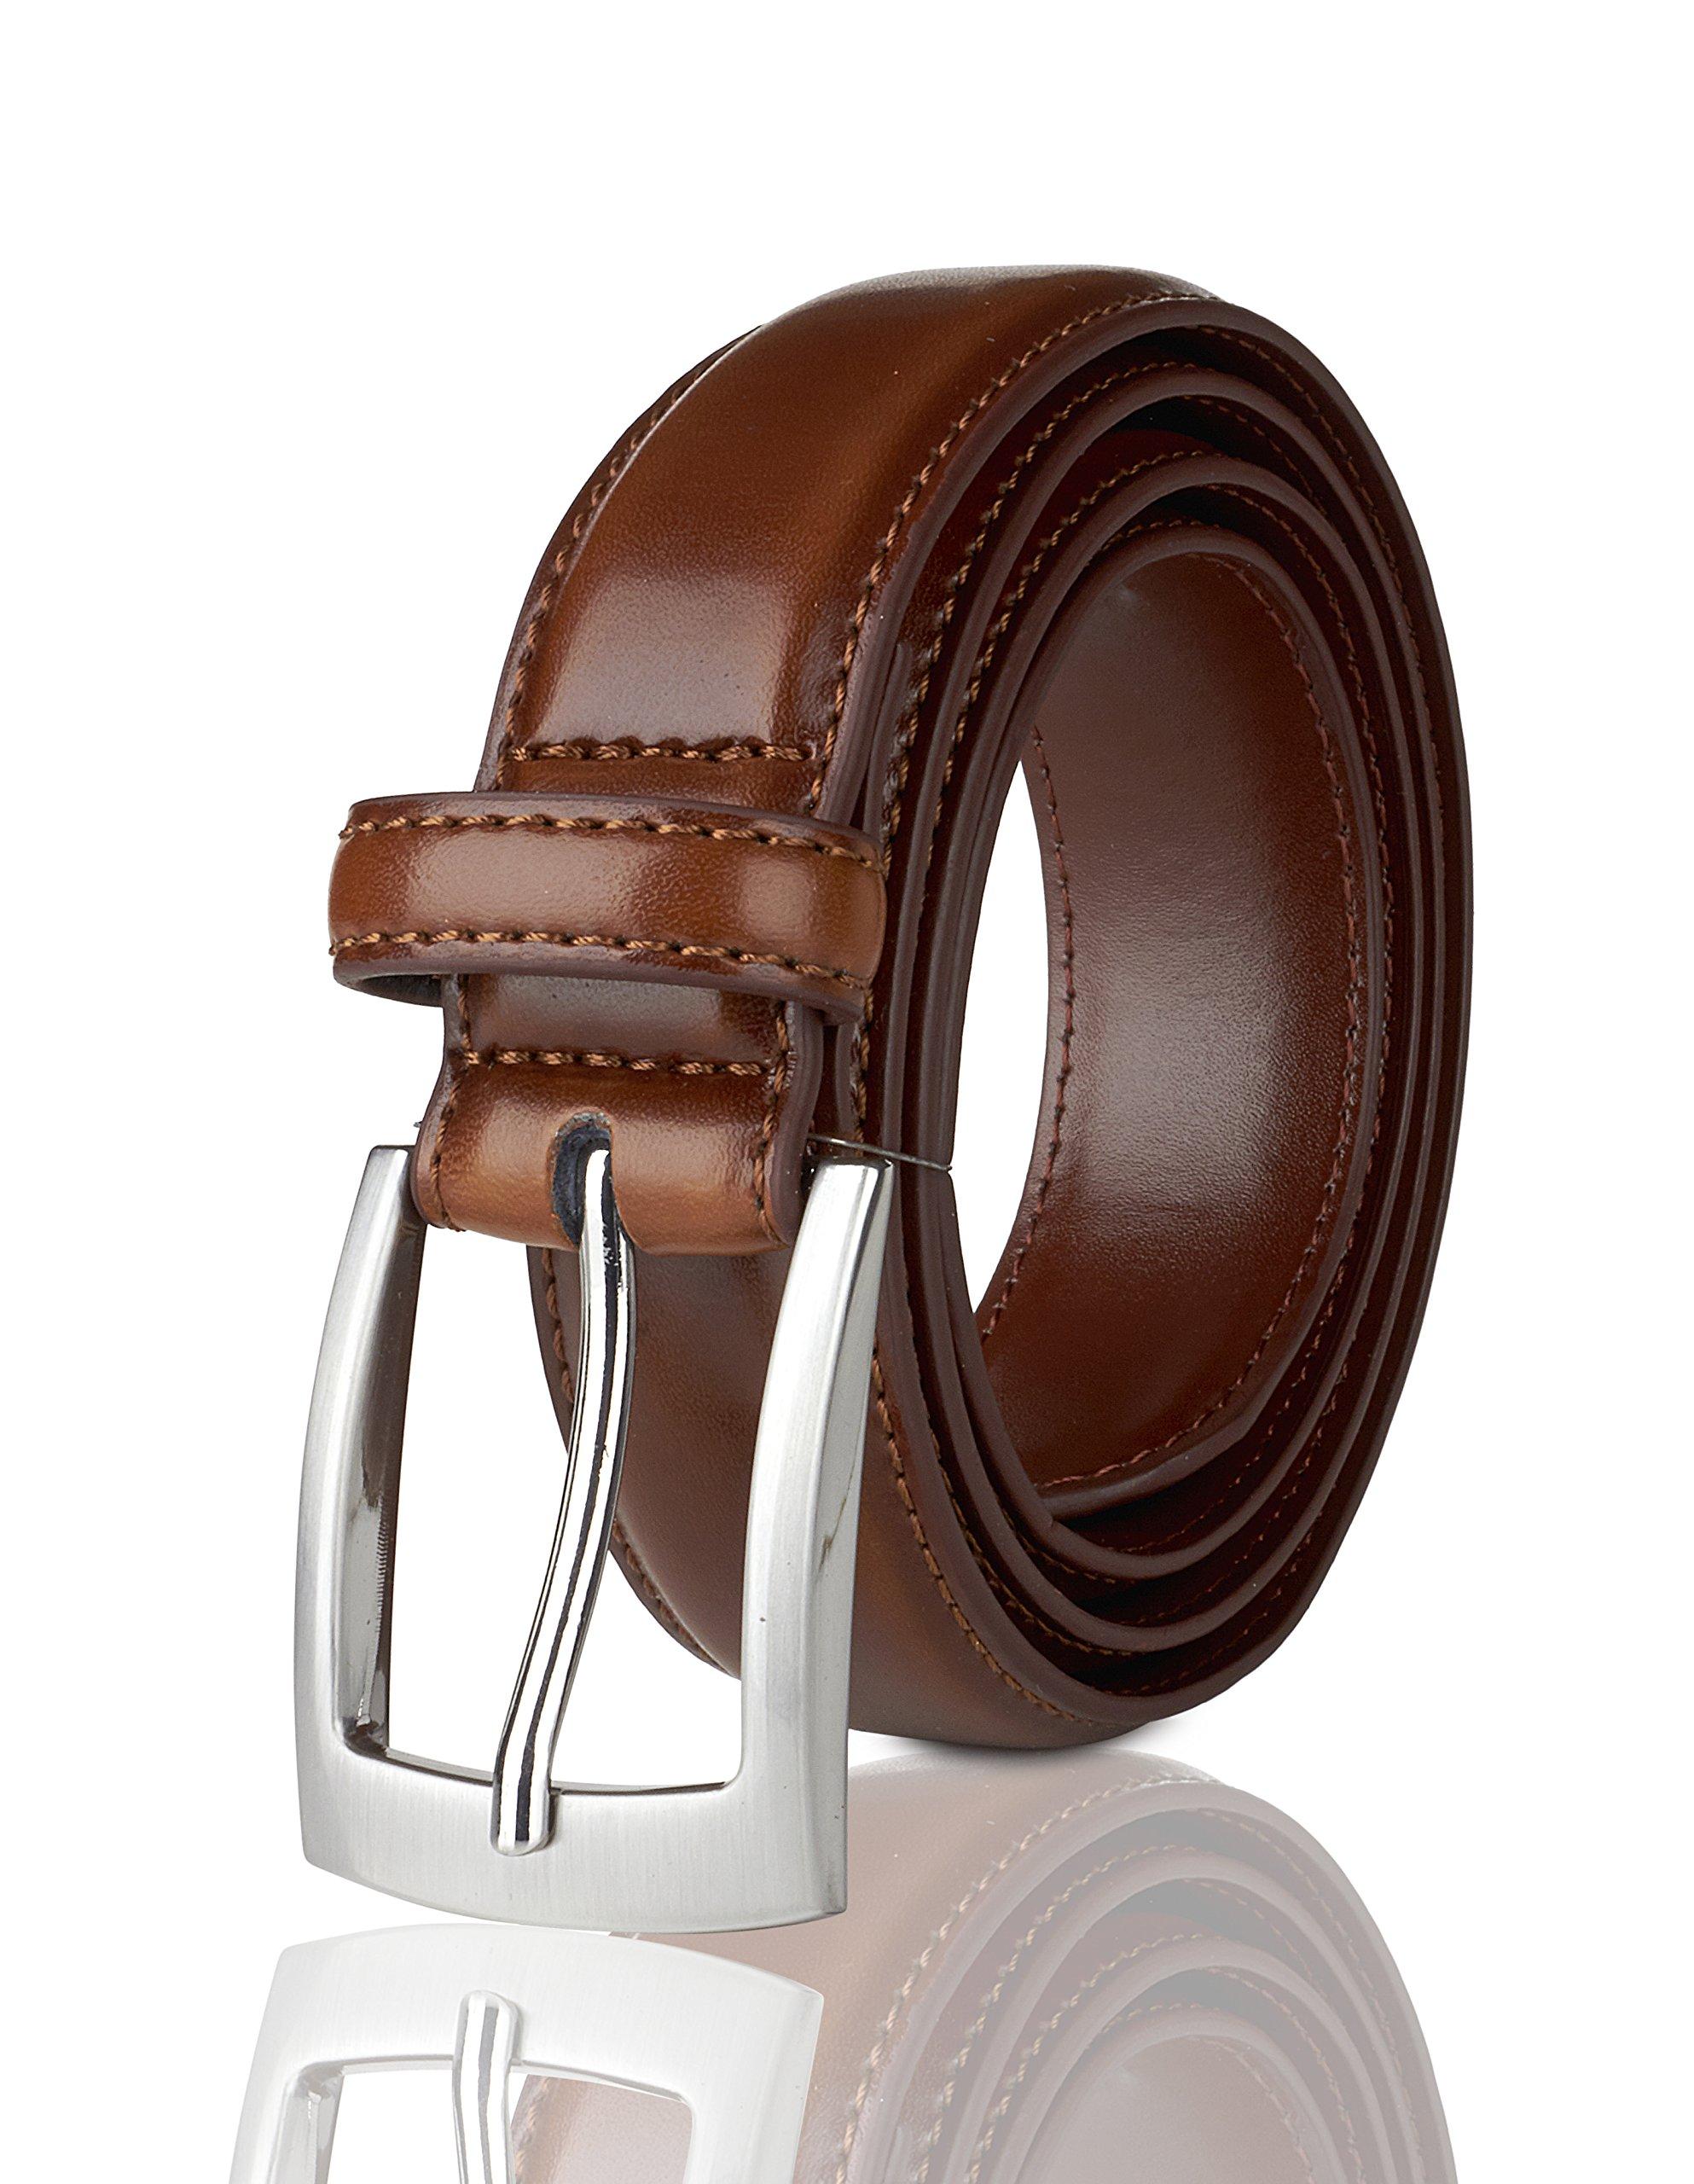 Belts for Men Mens Belt Buckle Genuine Leather Stitched Uniform Dress Belt - Amber - Size 50 (Waist 48) by Sportoli (Image #1)